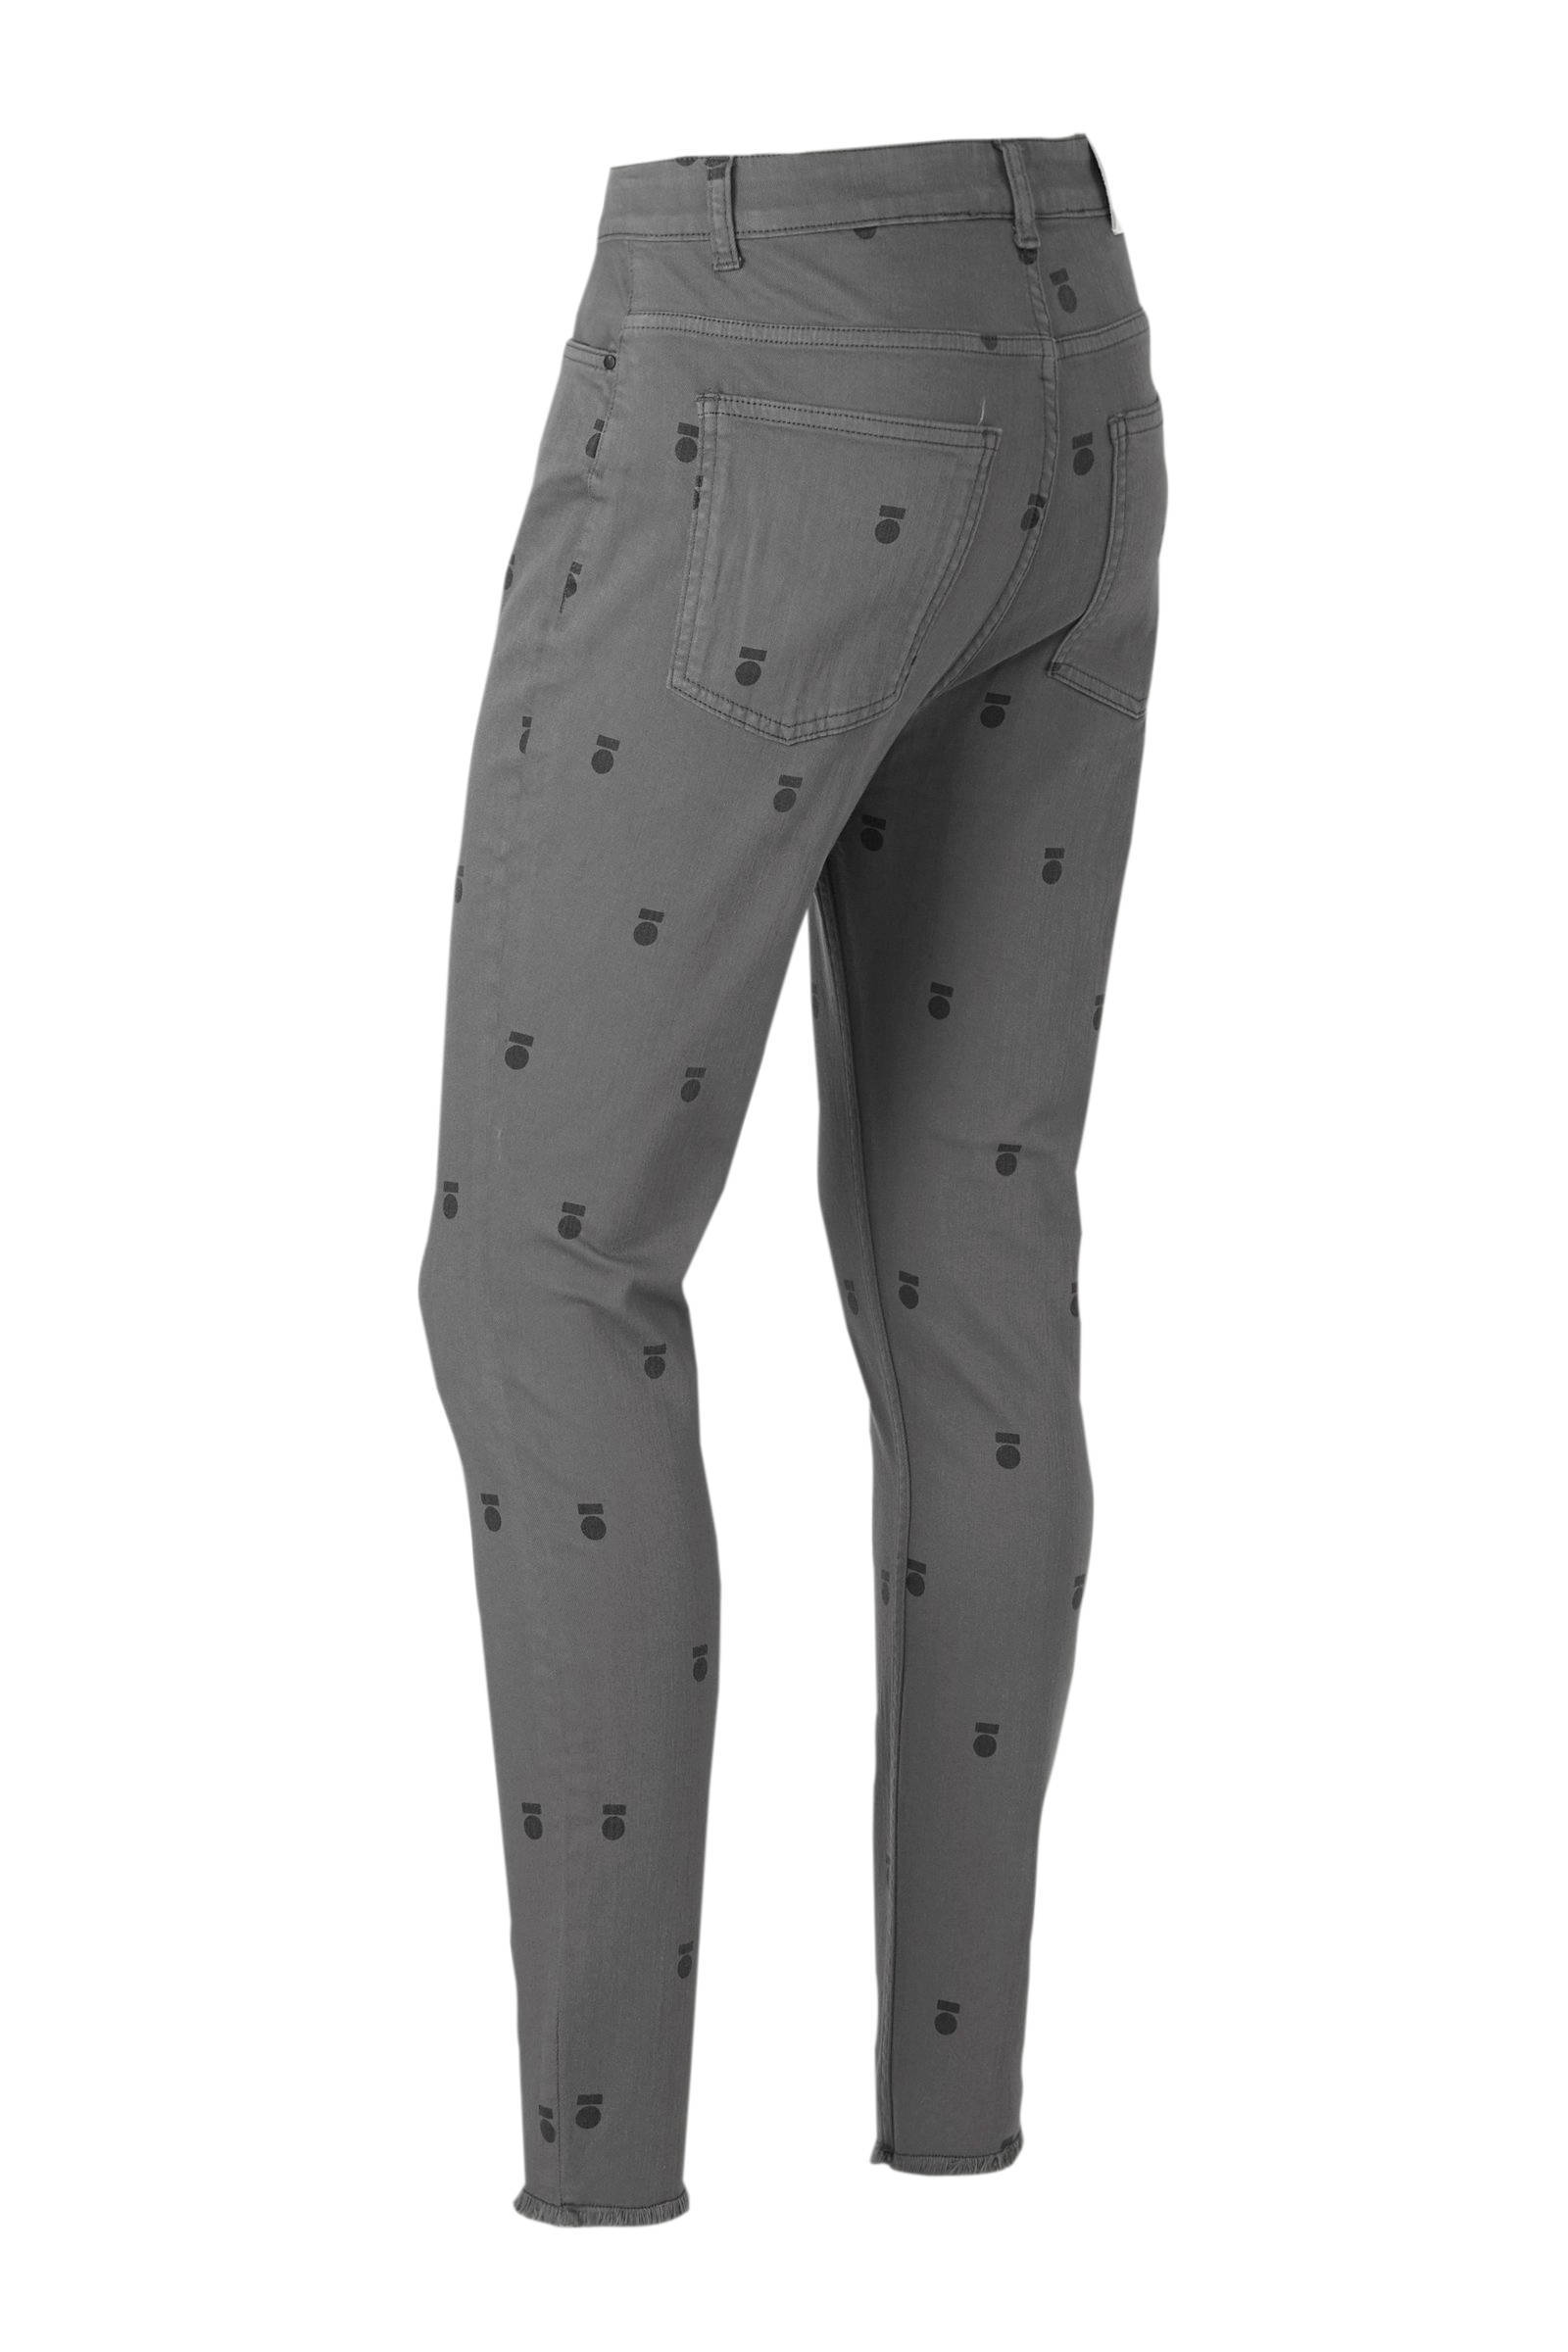 10DAYS high waist skinny jeans met all over print grijs